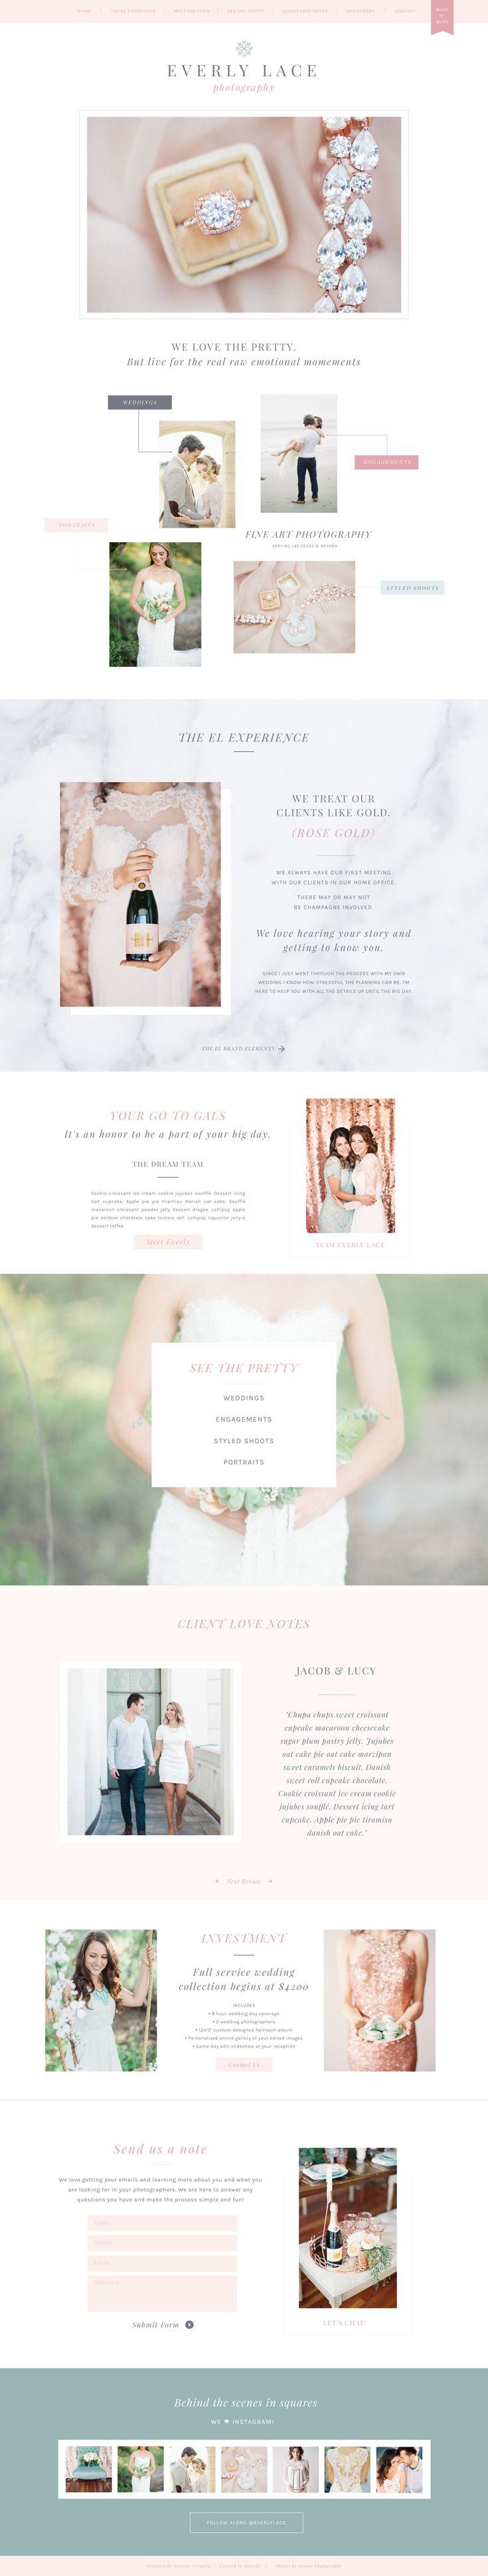 Everly Showit 5 Website Template Design by Seaside Creative. Beautiful, Feminine, Luxurious, Romantic, Simple